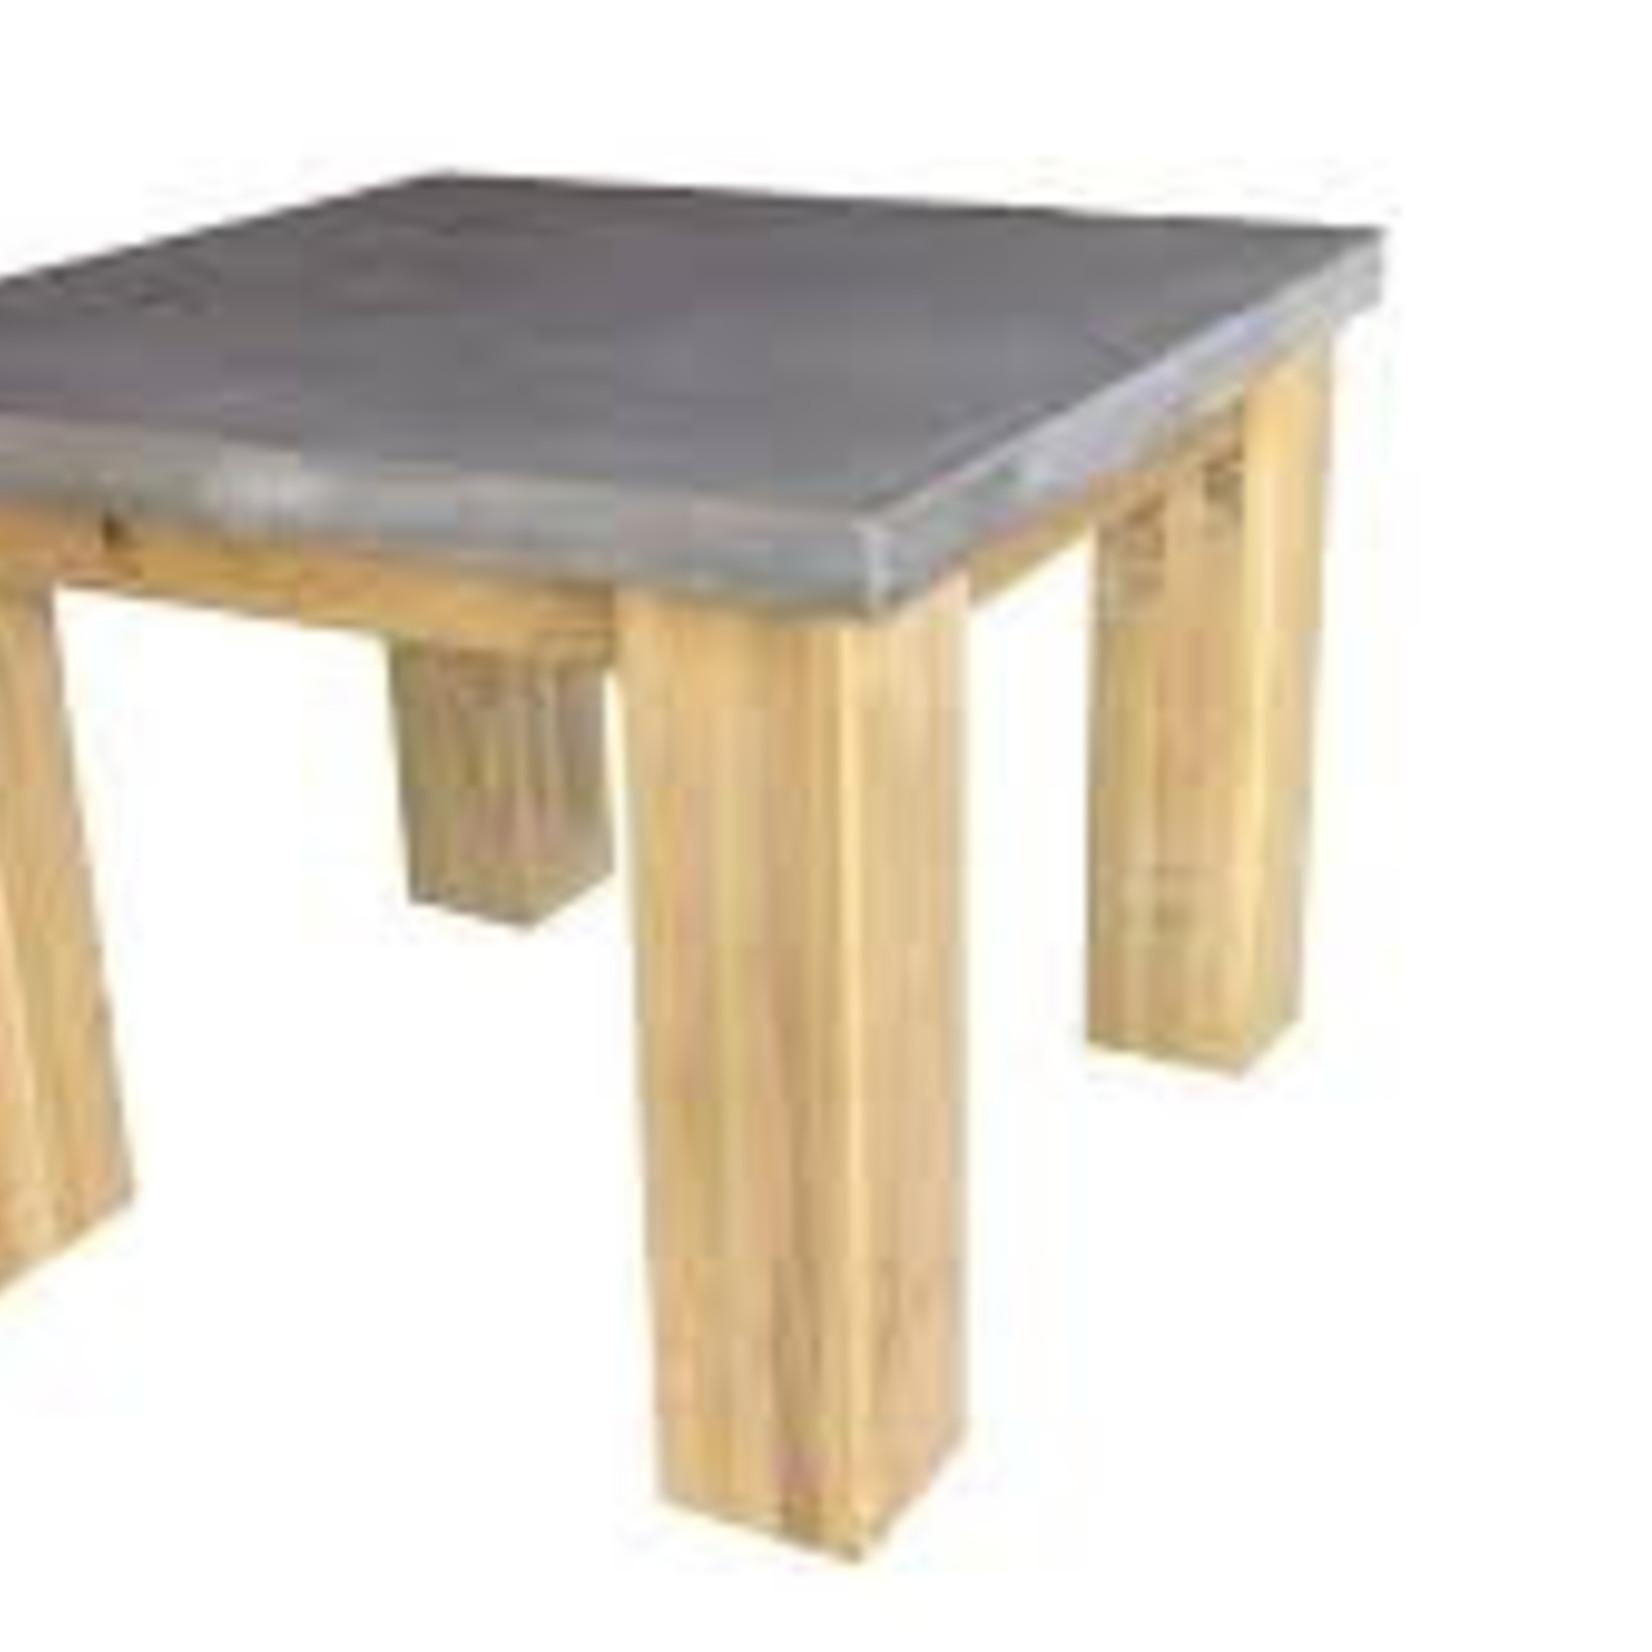 Tafelblad 80 cm breed tot 150 cm lang - Boncreat Beton Ciré - 66 mm